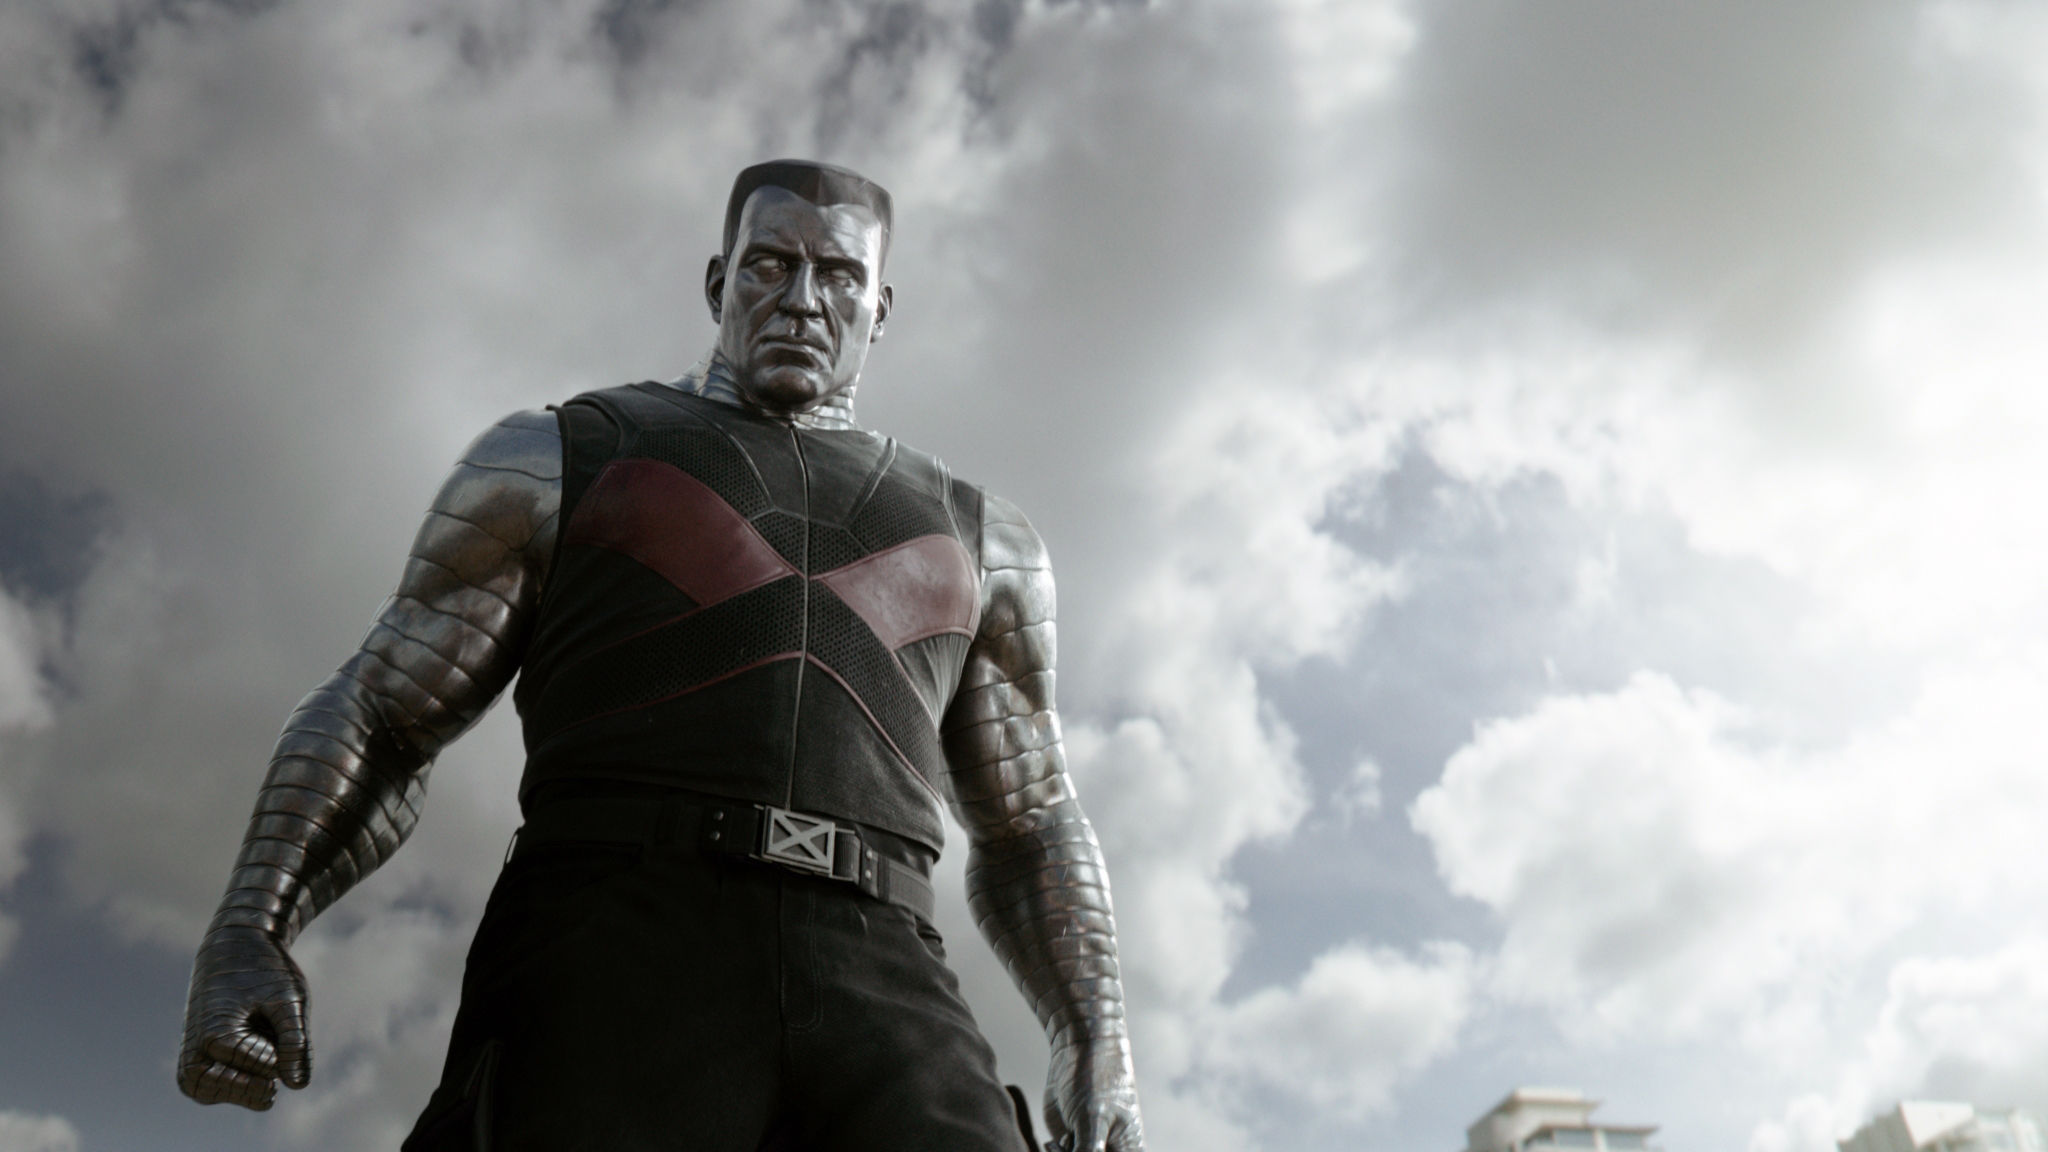 Stefan Kapicic será Colossus en Deadpool